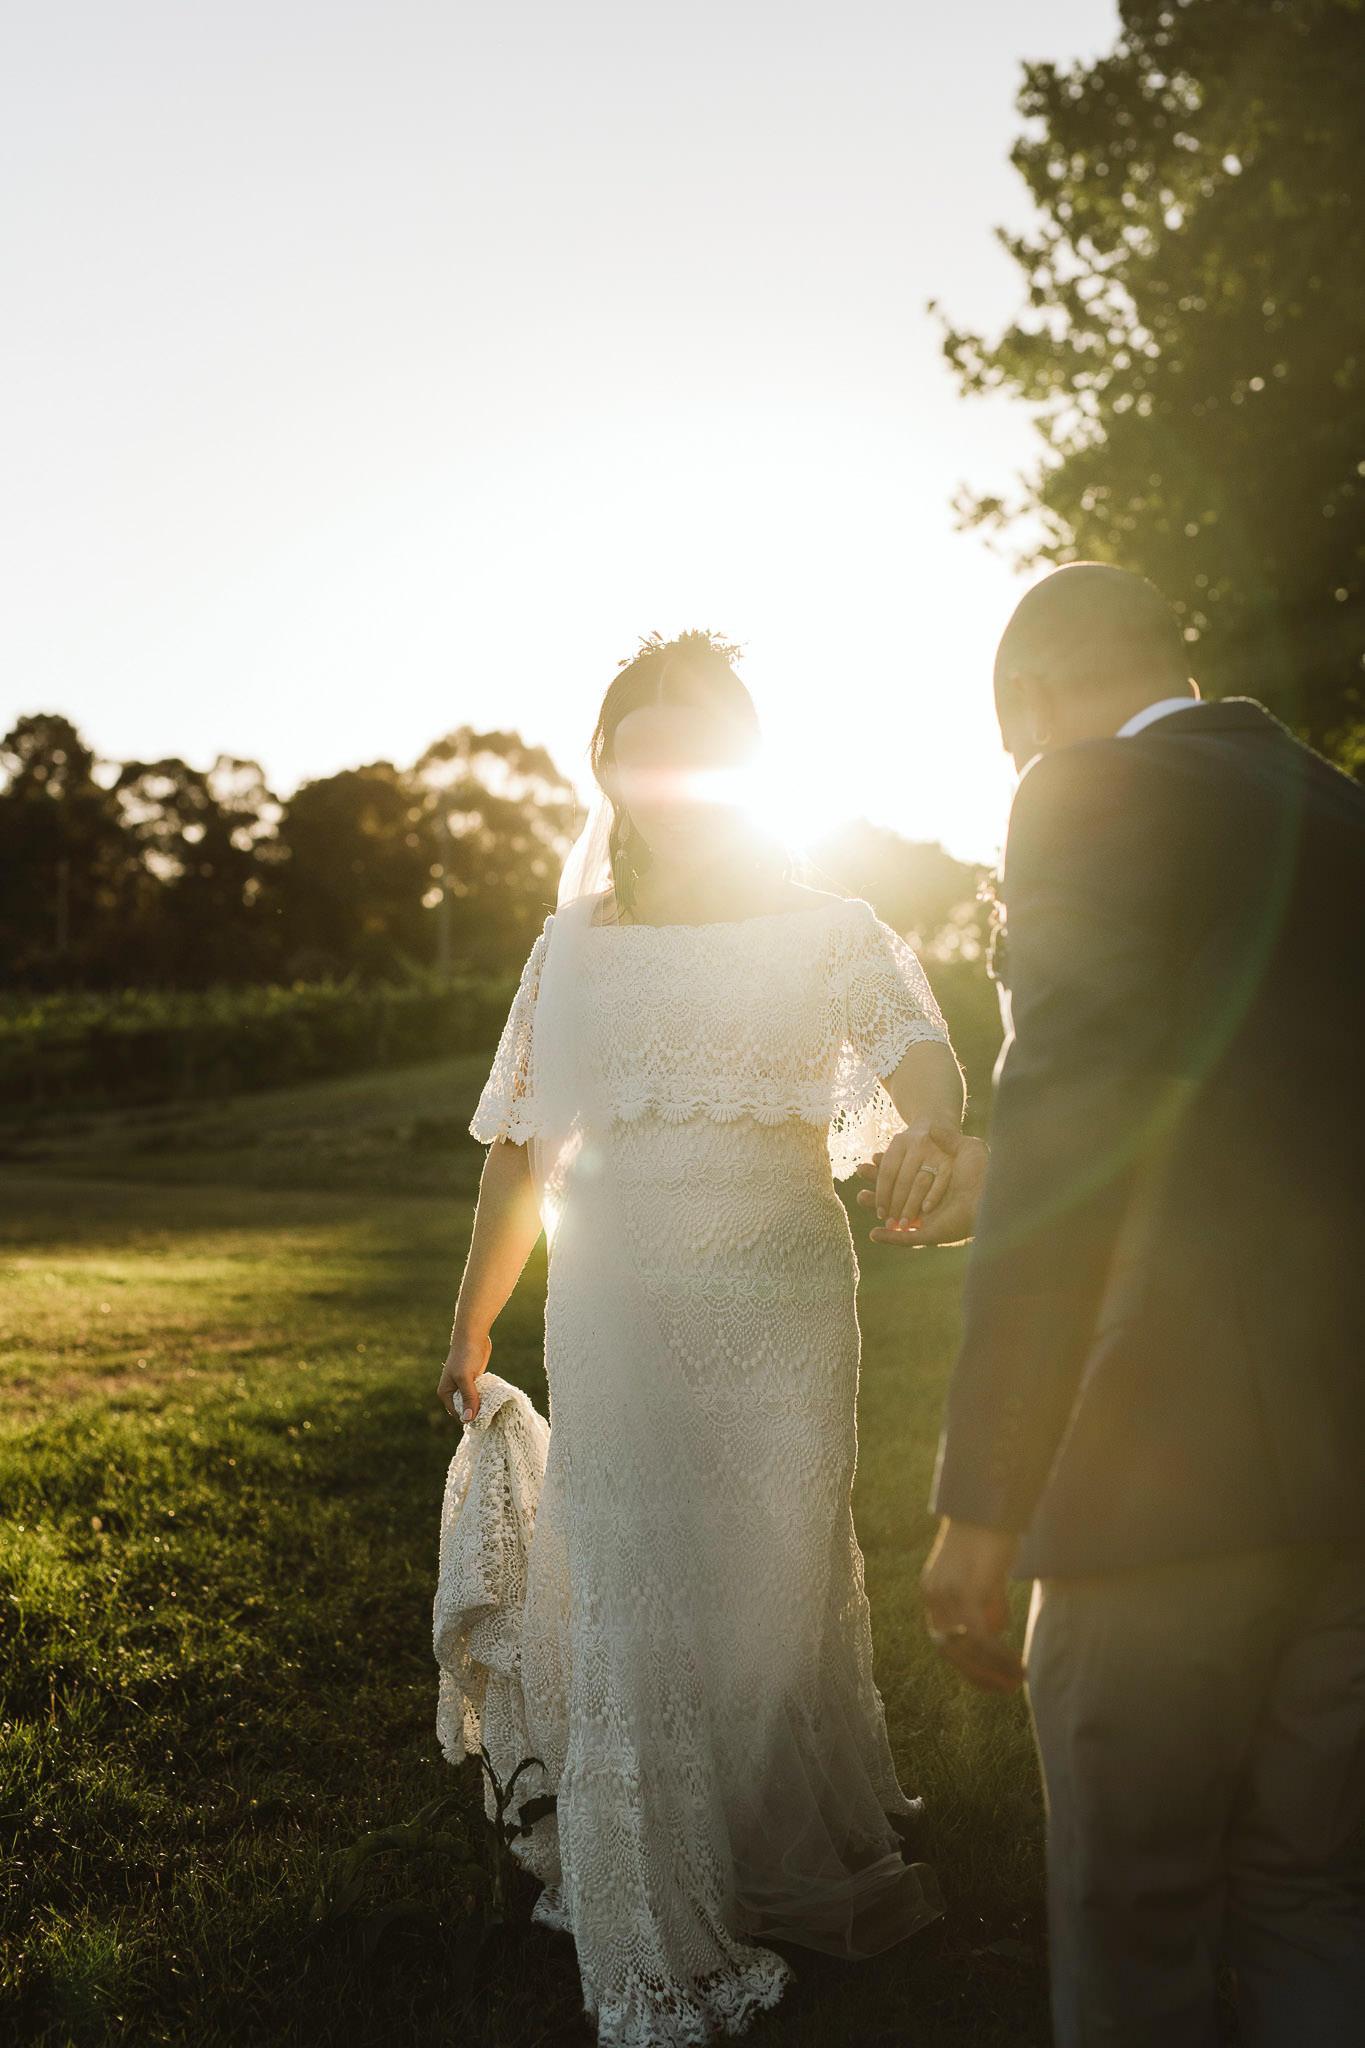 The Farm Yarra Valley Wedding Photography Ashleigh Haase-84.jpg